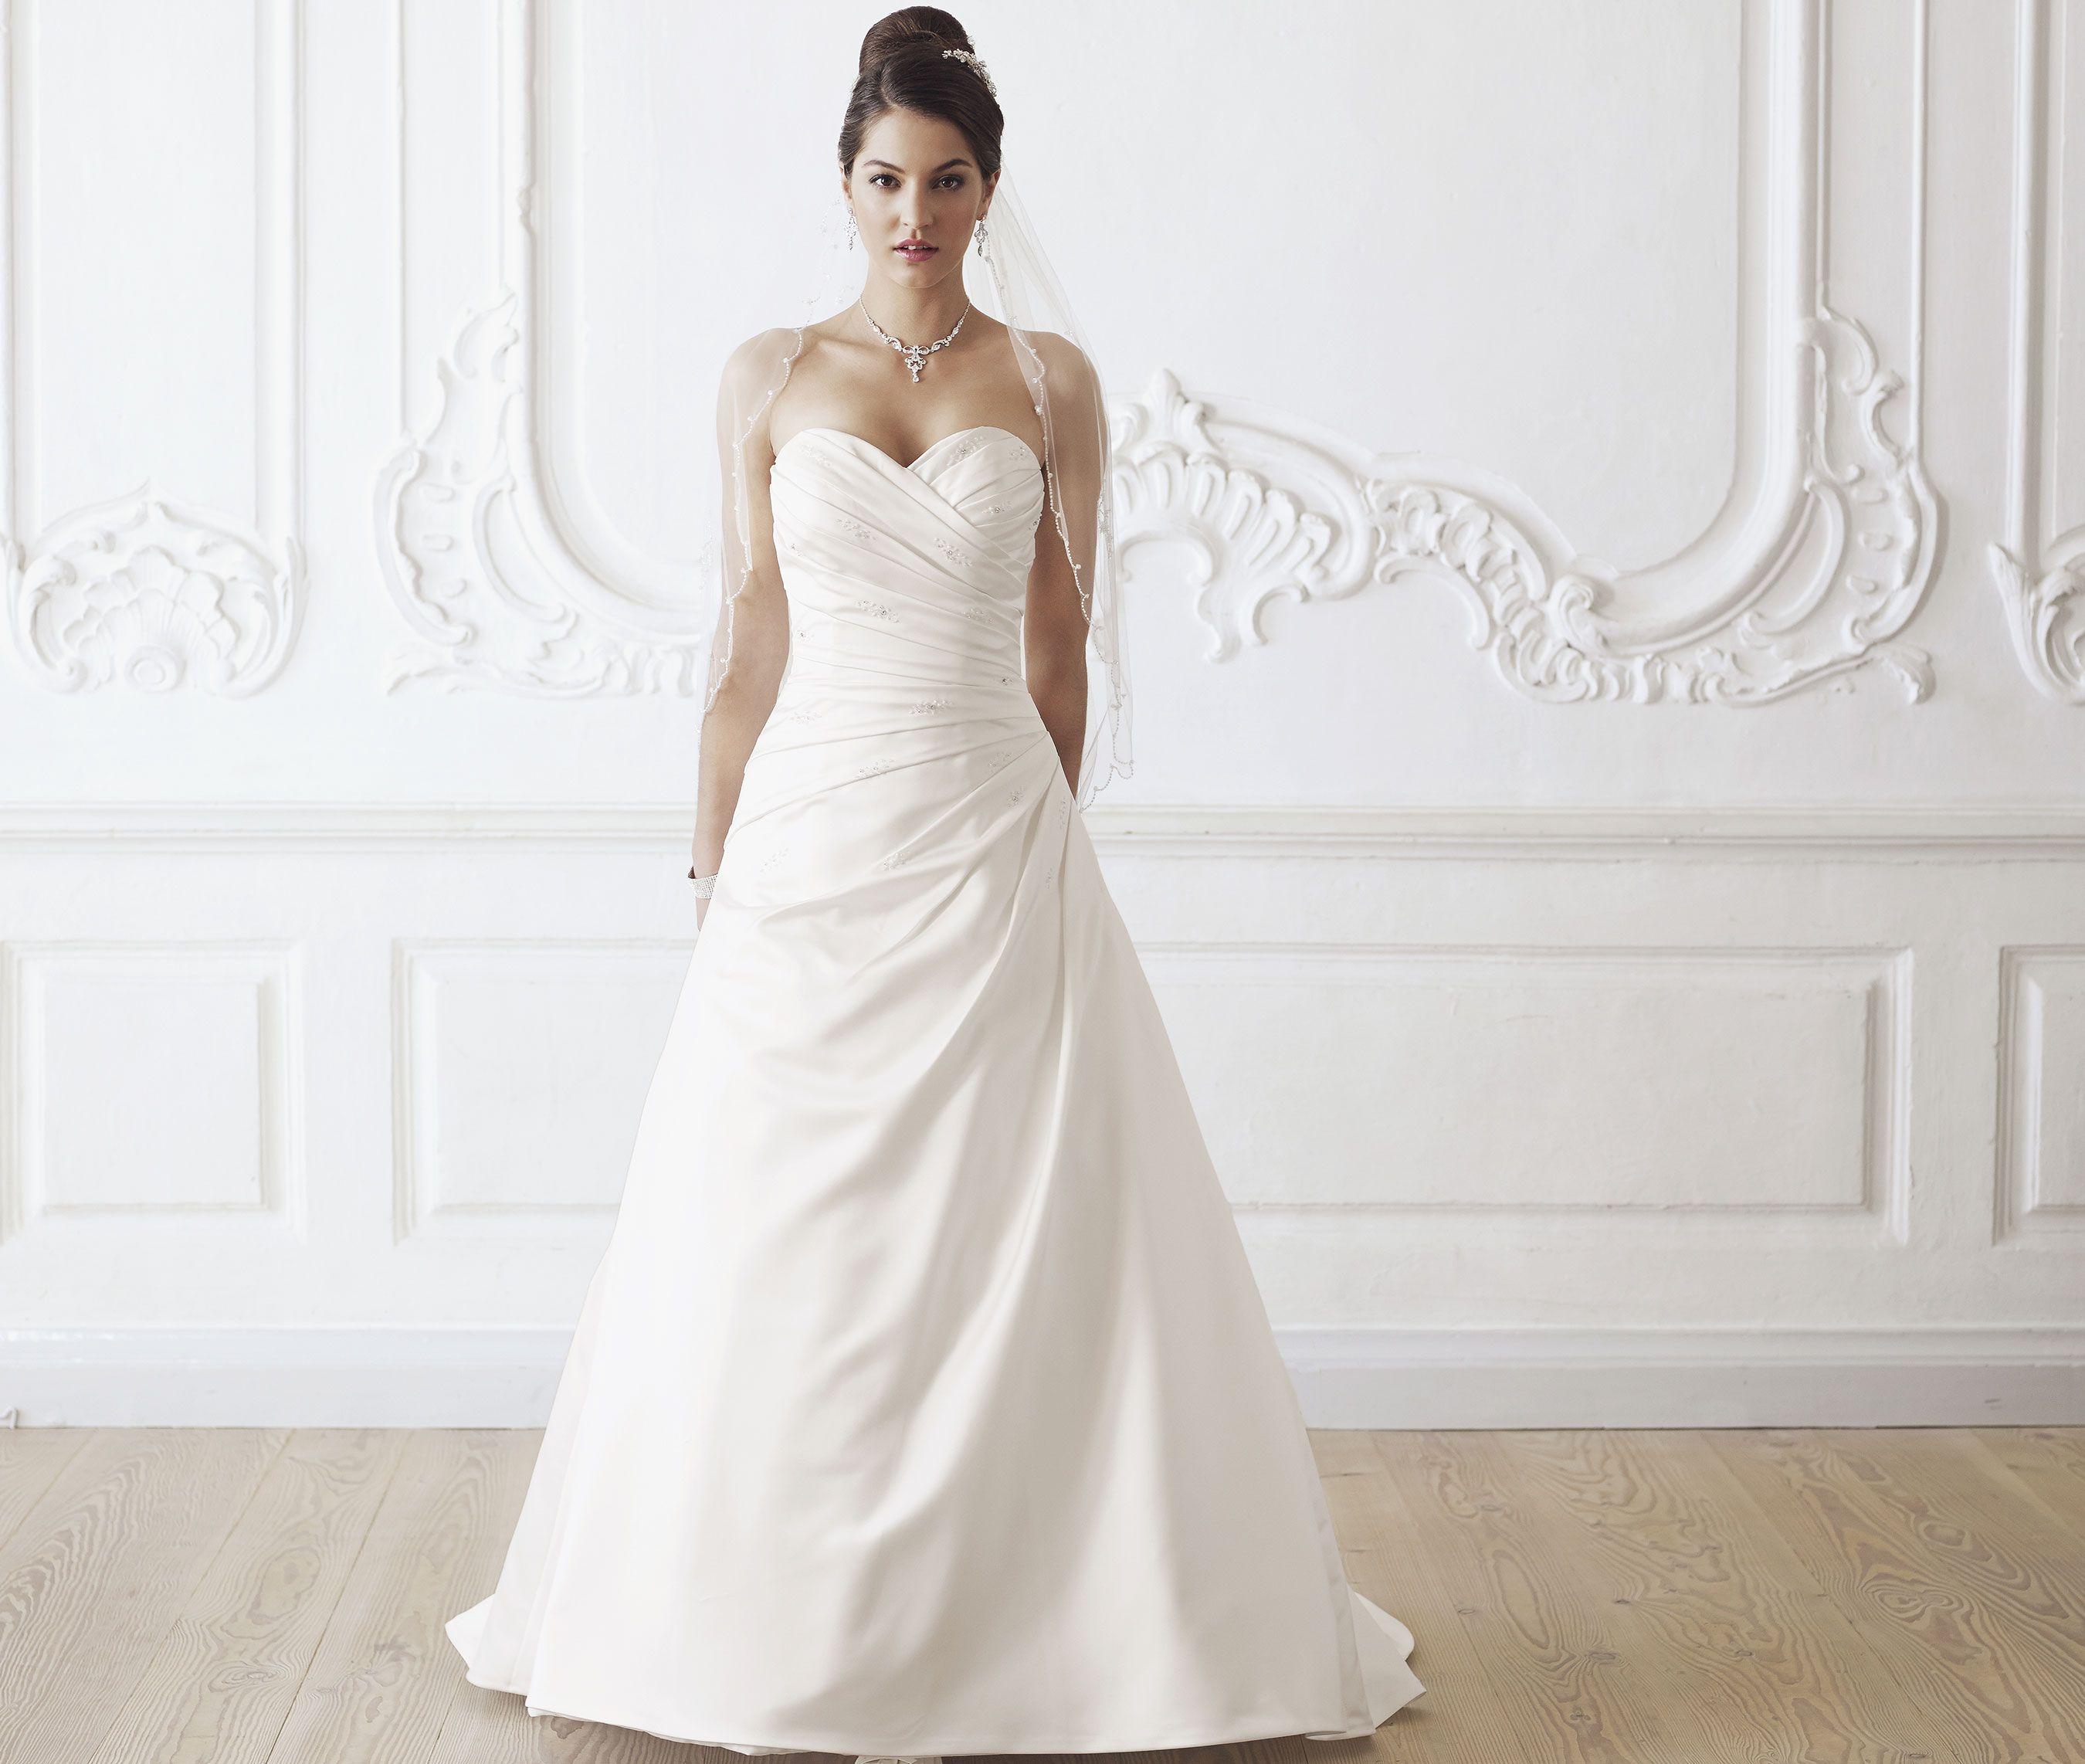 LILLY Brautkleid 08 3260 CR Hochzeitskleid